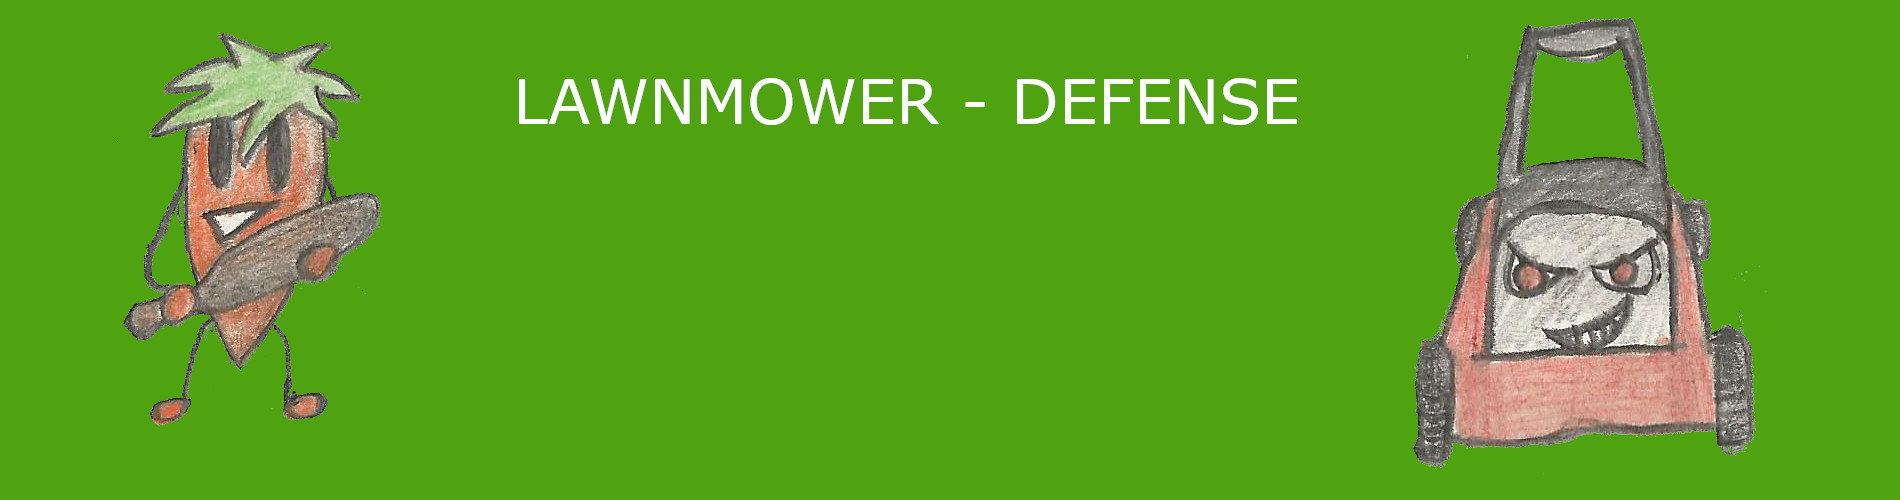 Lawnmower Defense